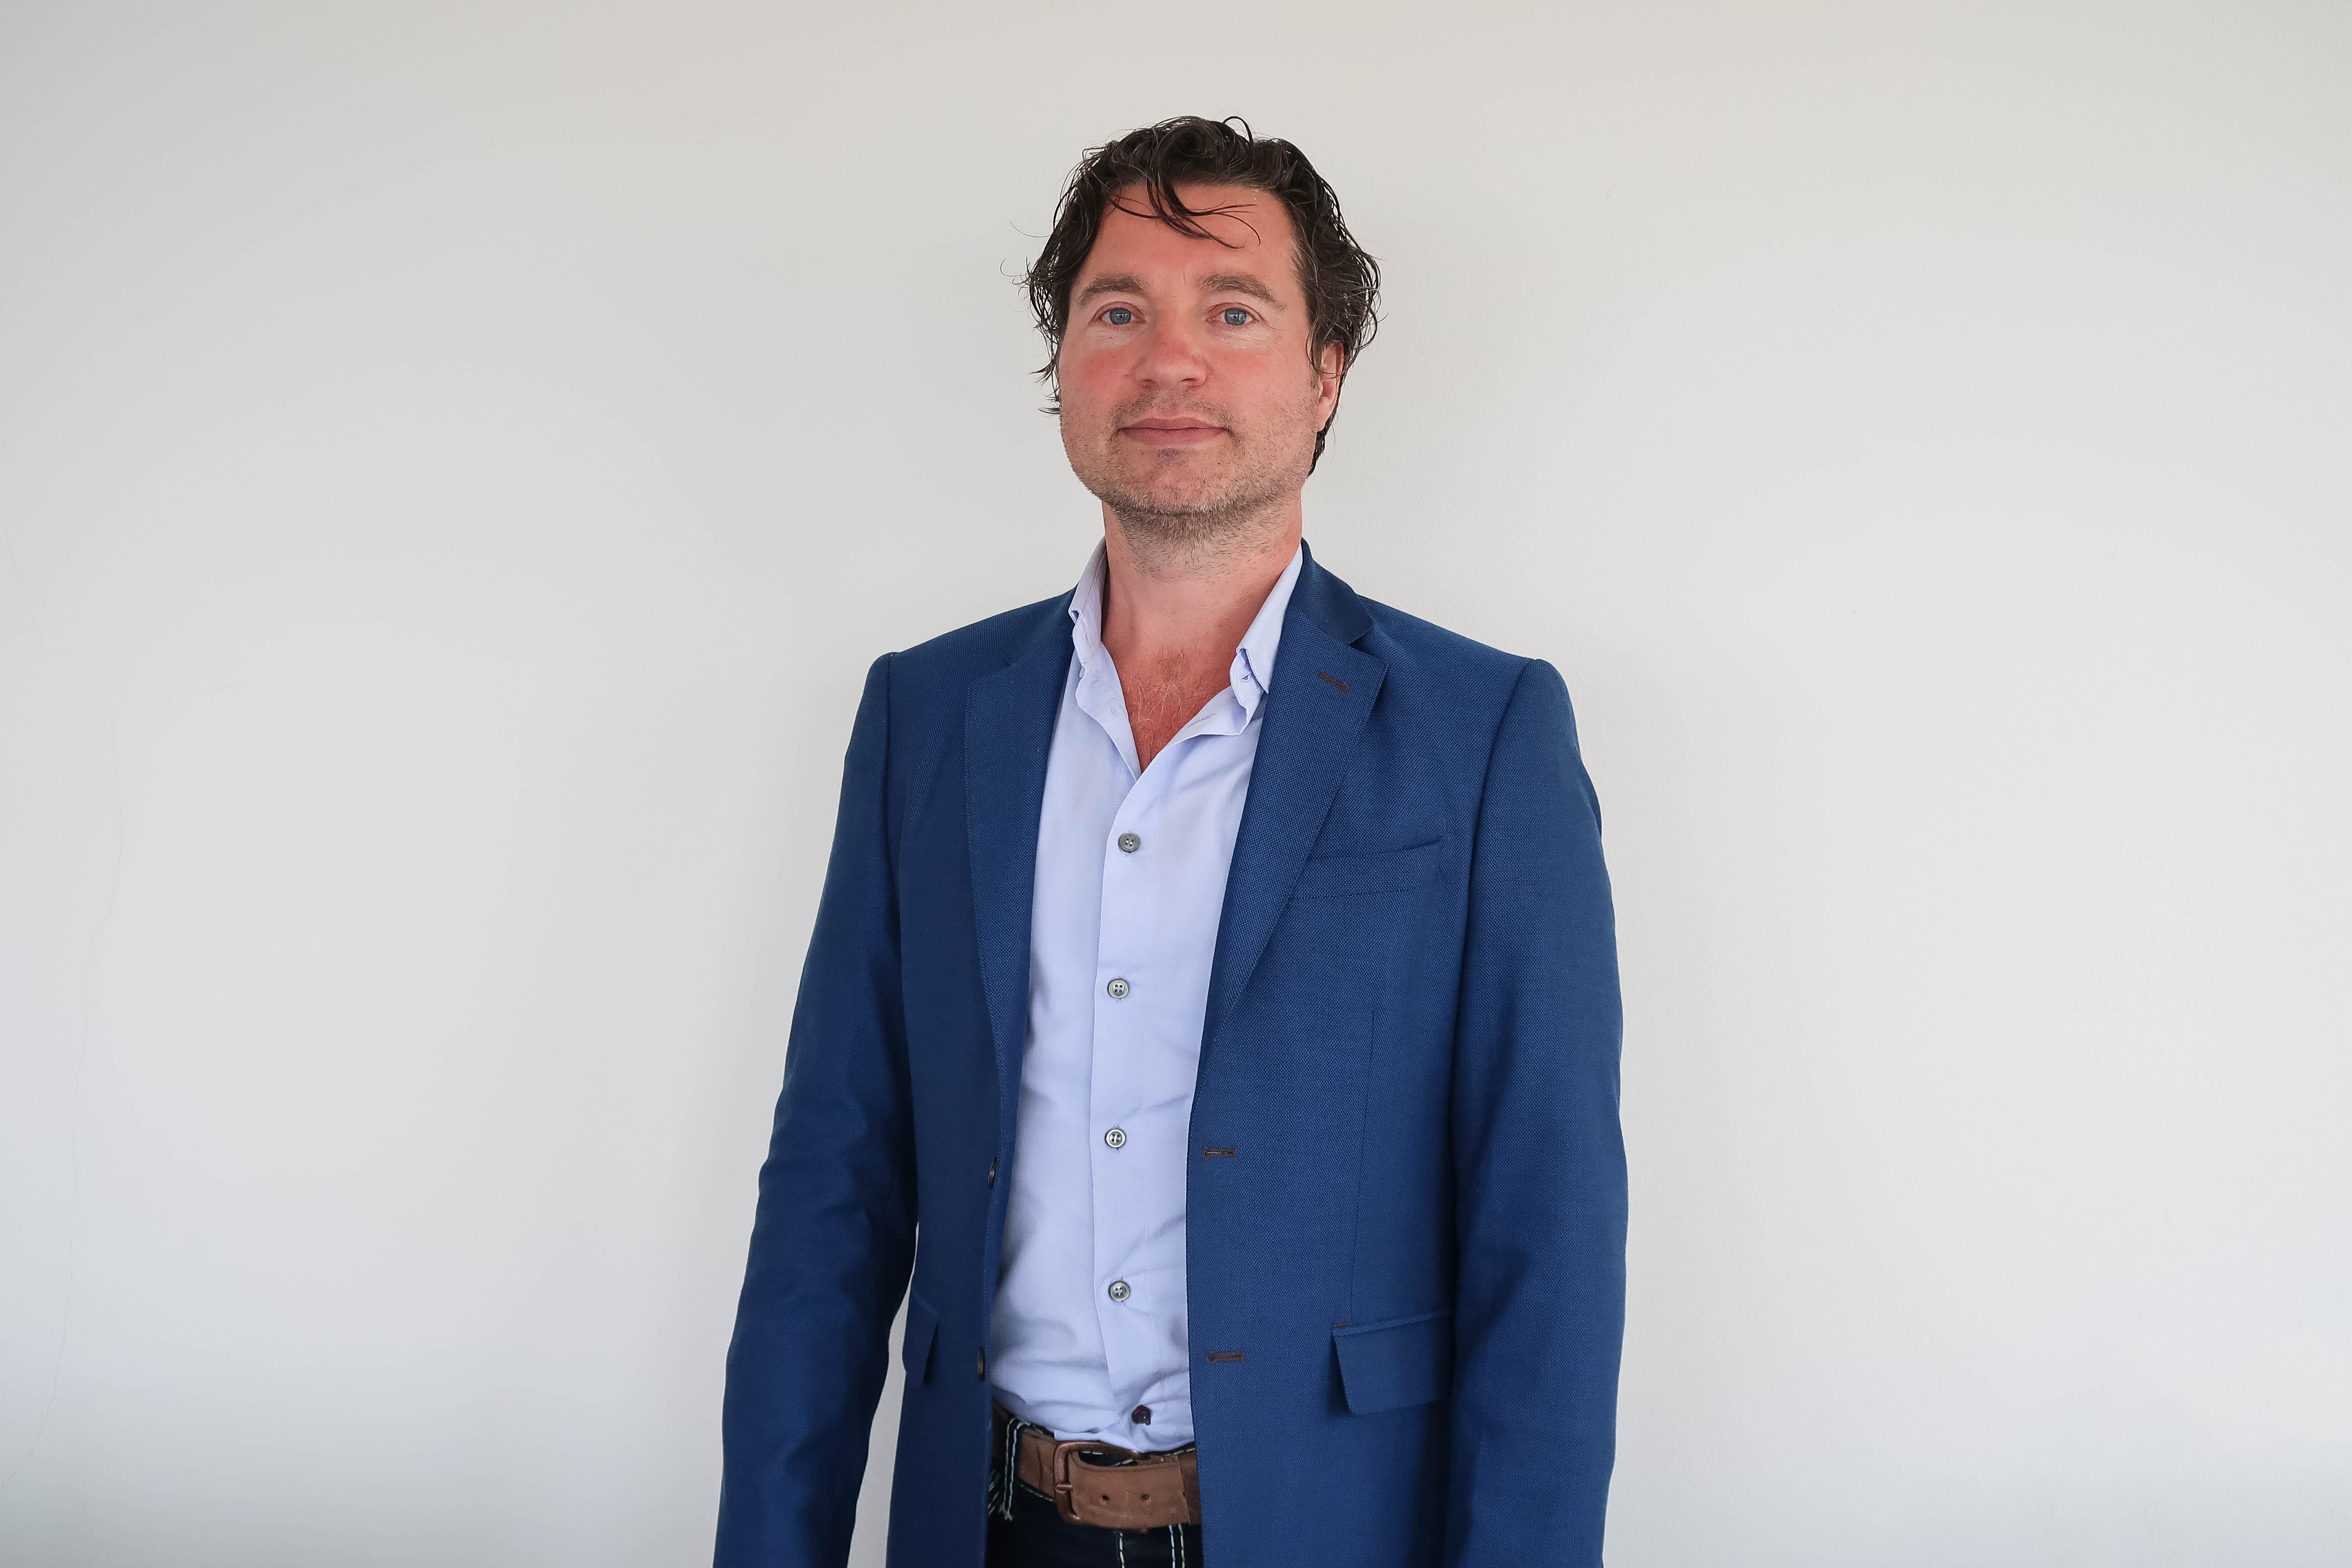 Arnout van der Swaluw